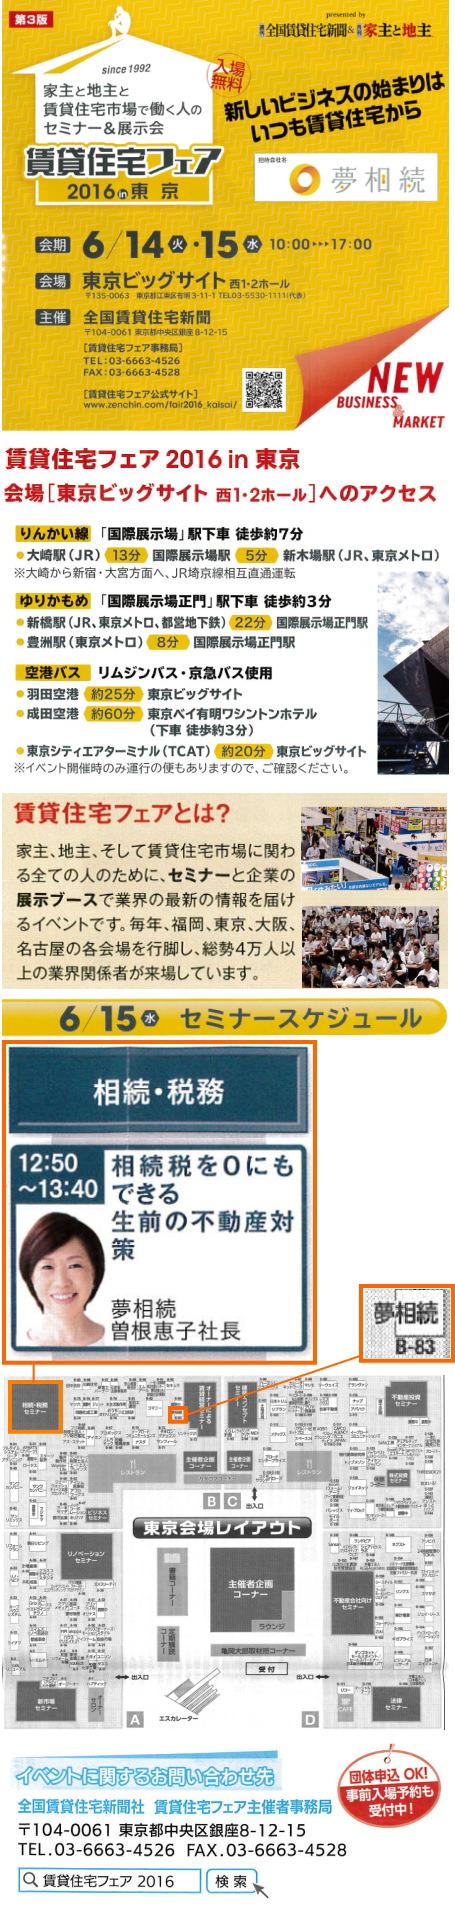 賃貸住宅フェア2016 東京 株式会社夢相続 ブース出展・セミナー講師担当